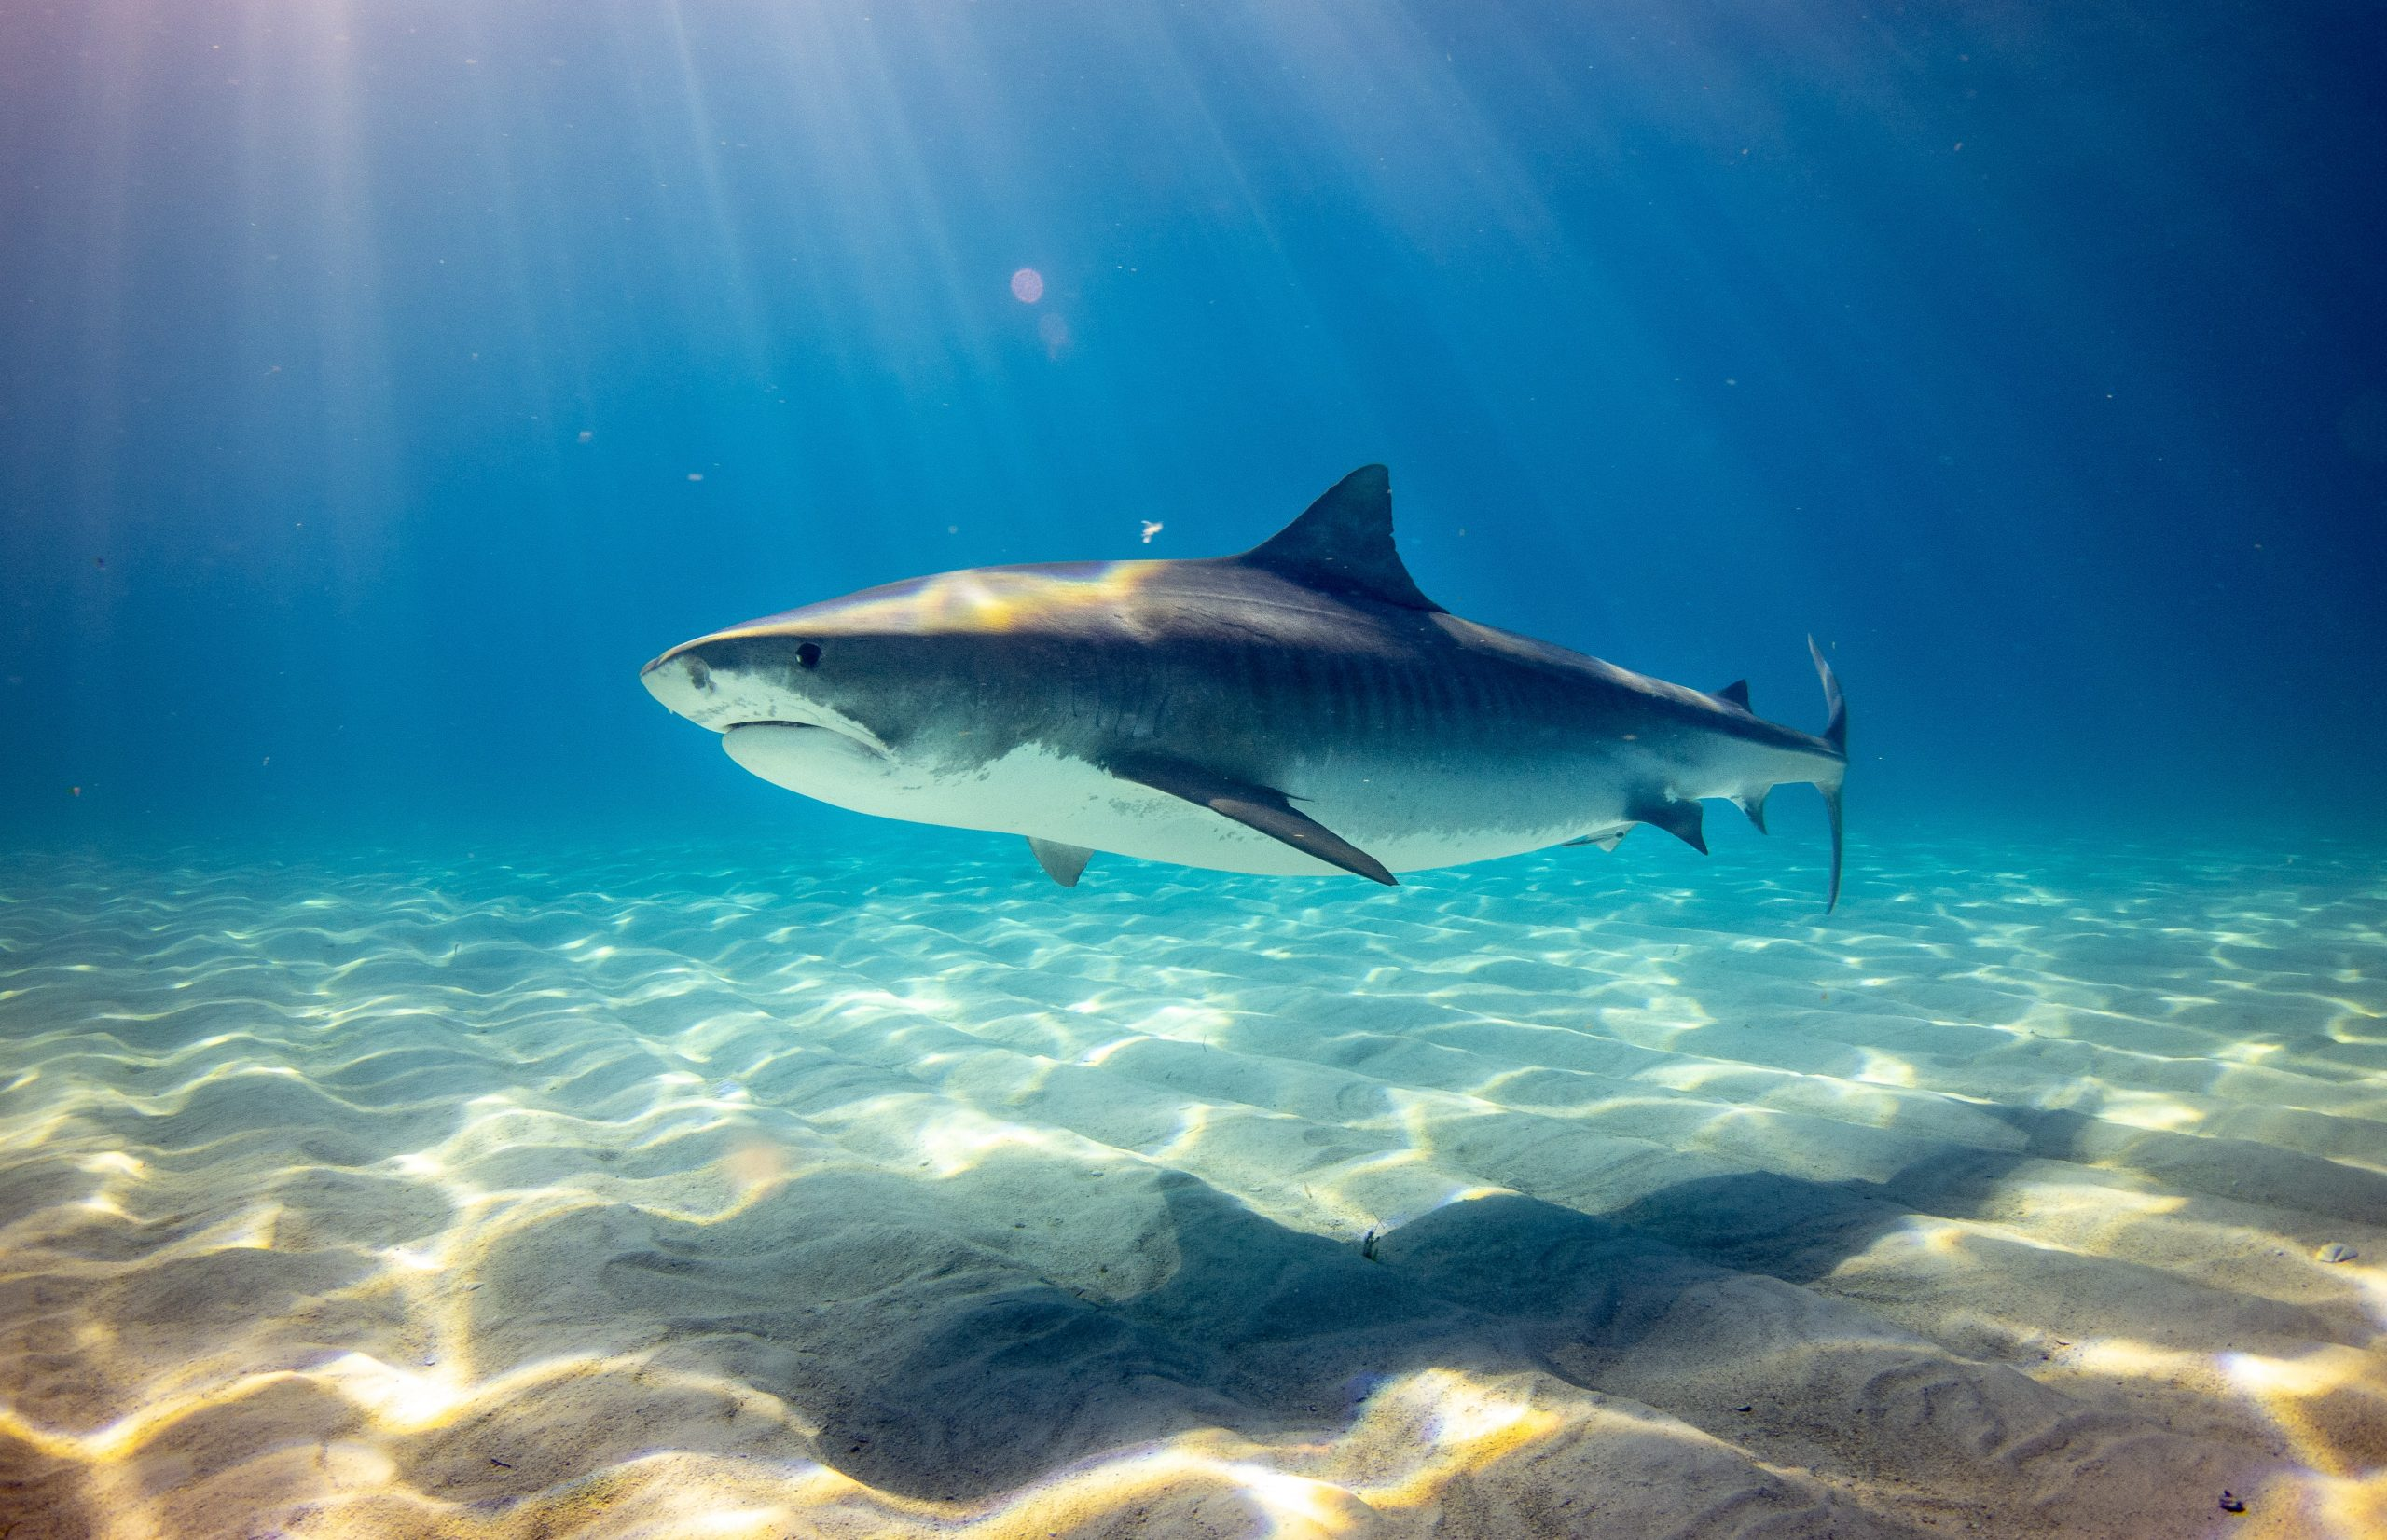 Sharks-at-the-Beach